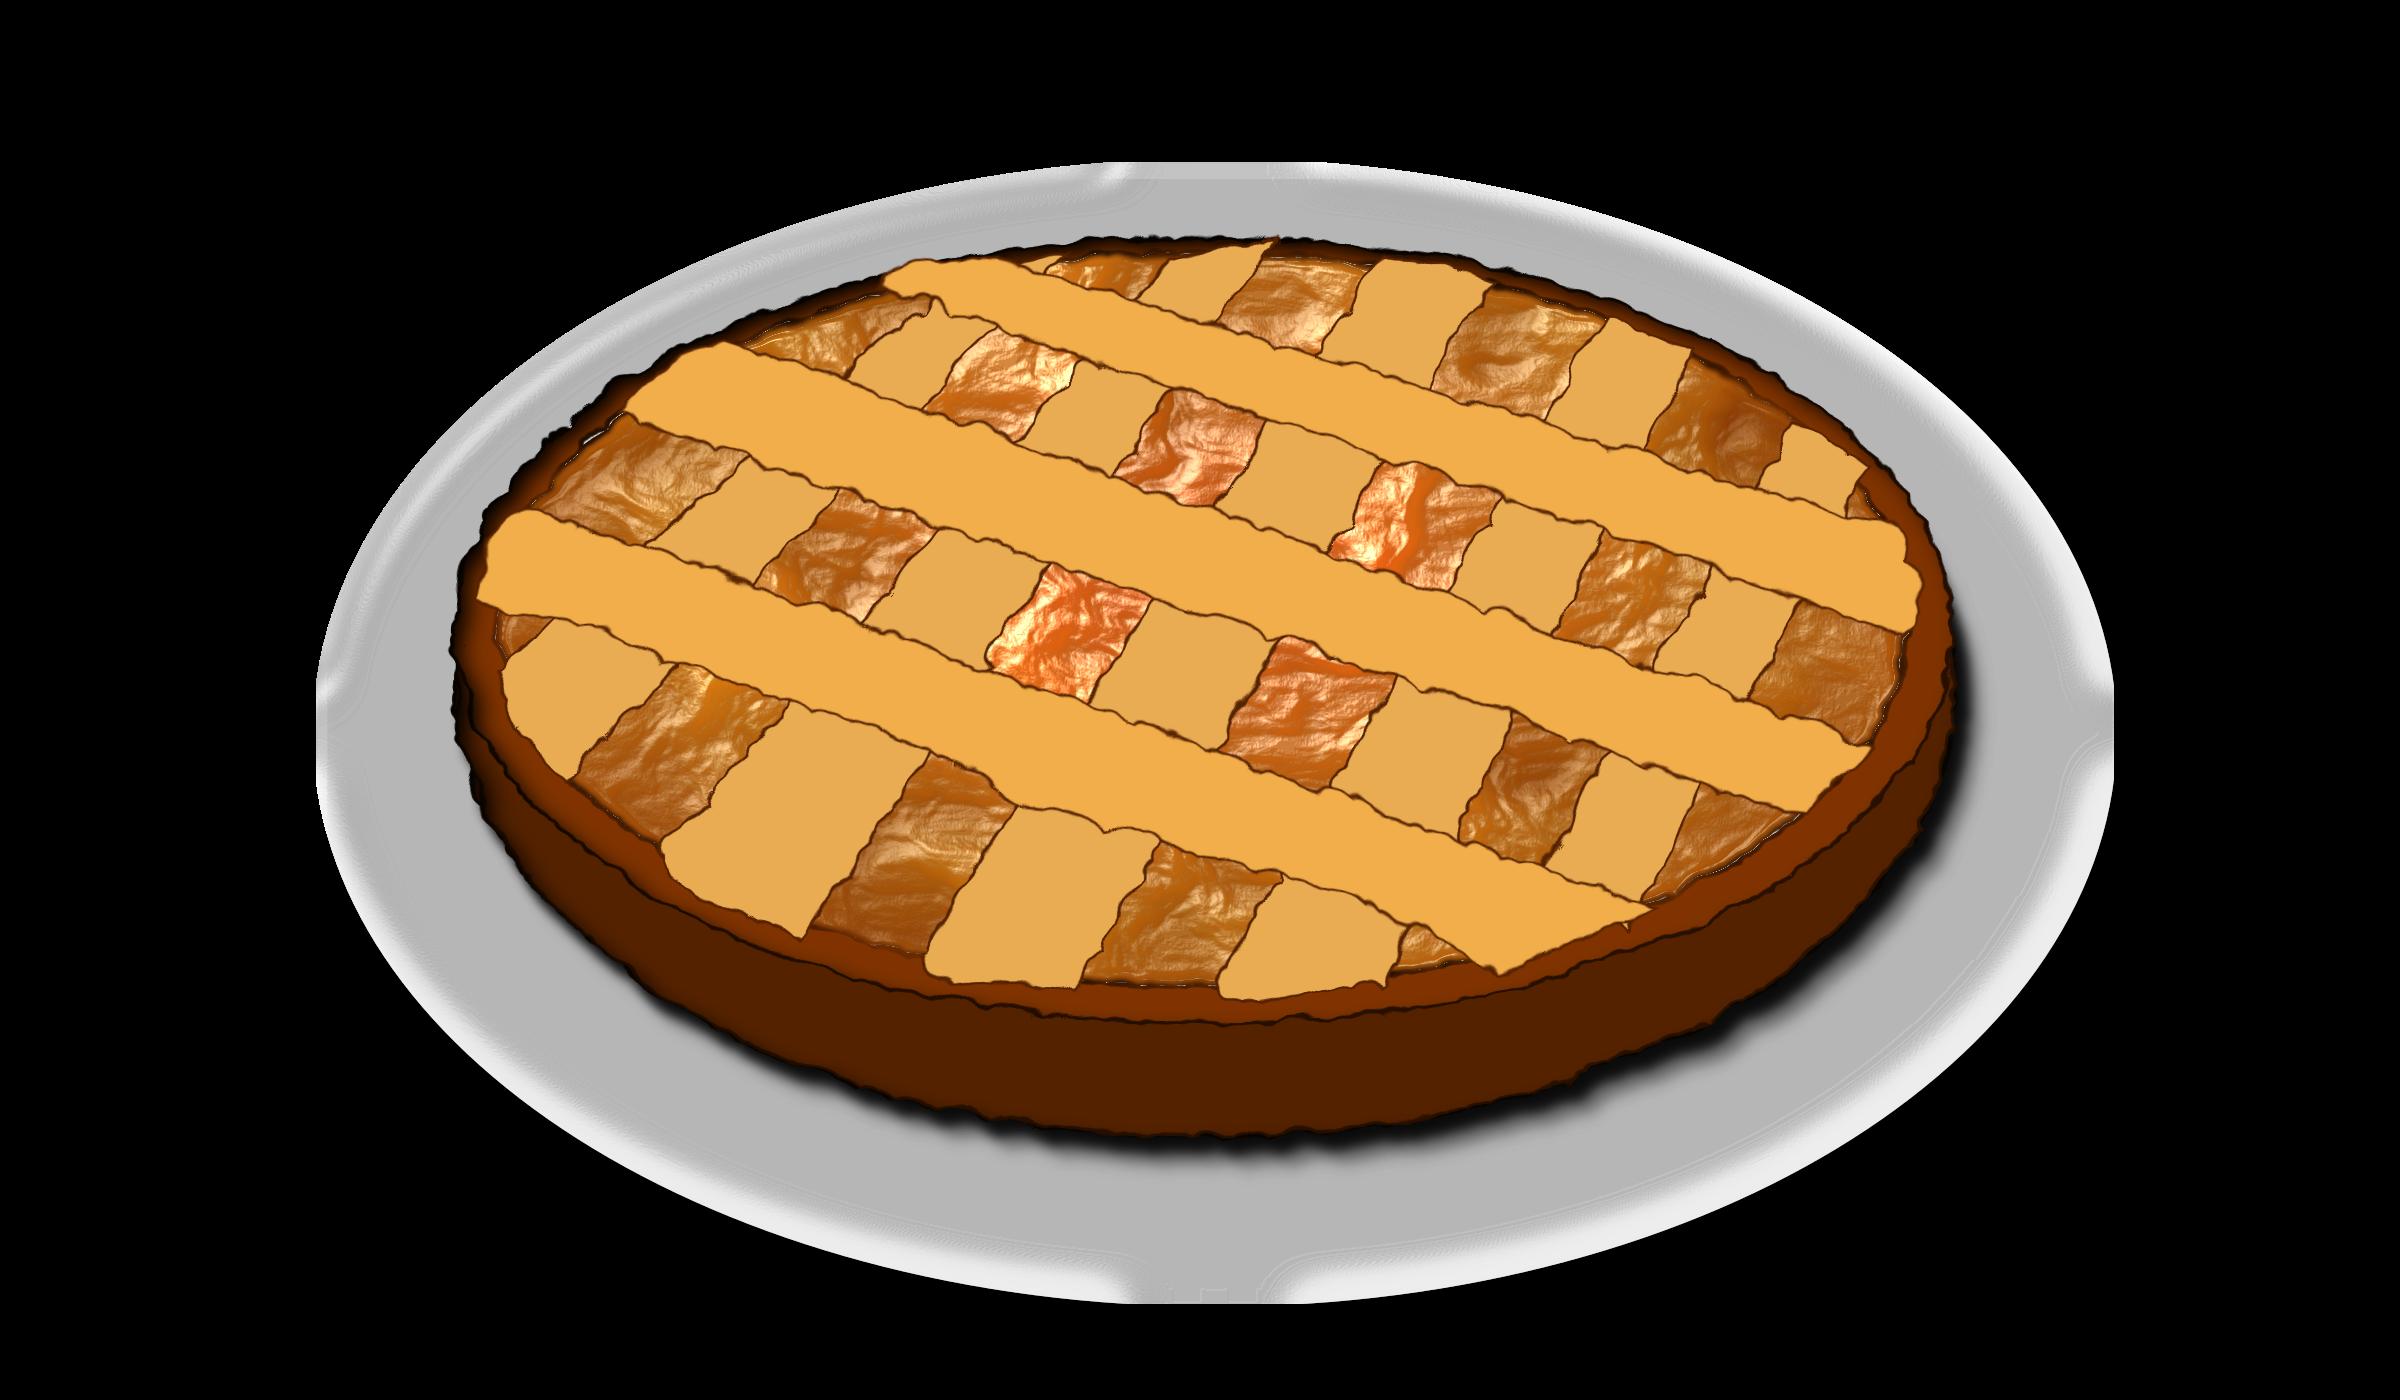 Clipart cake tart. Marmalade big image png